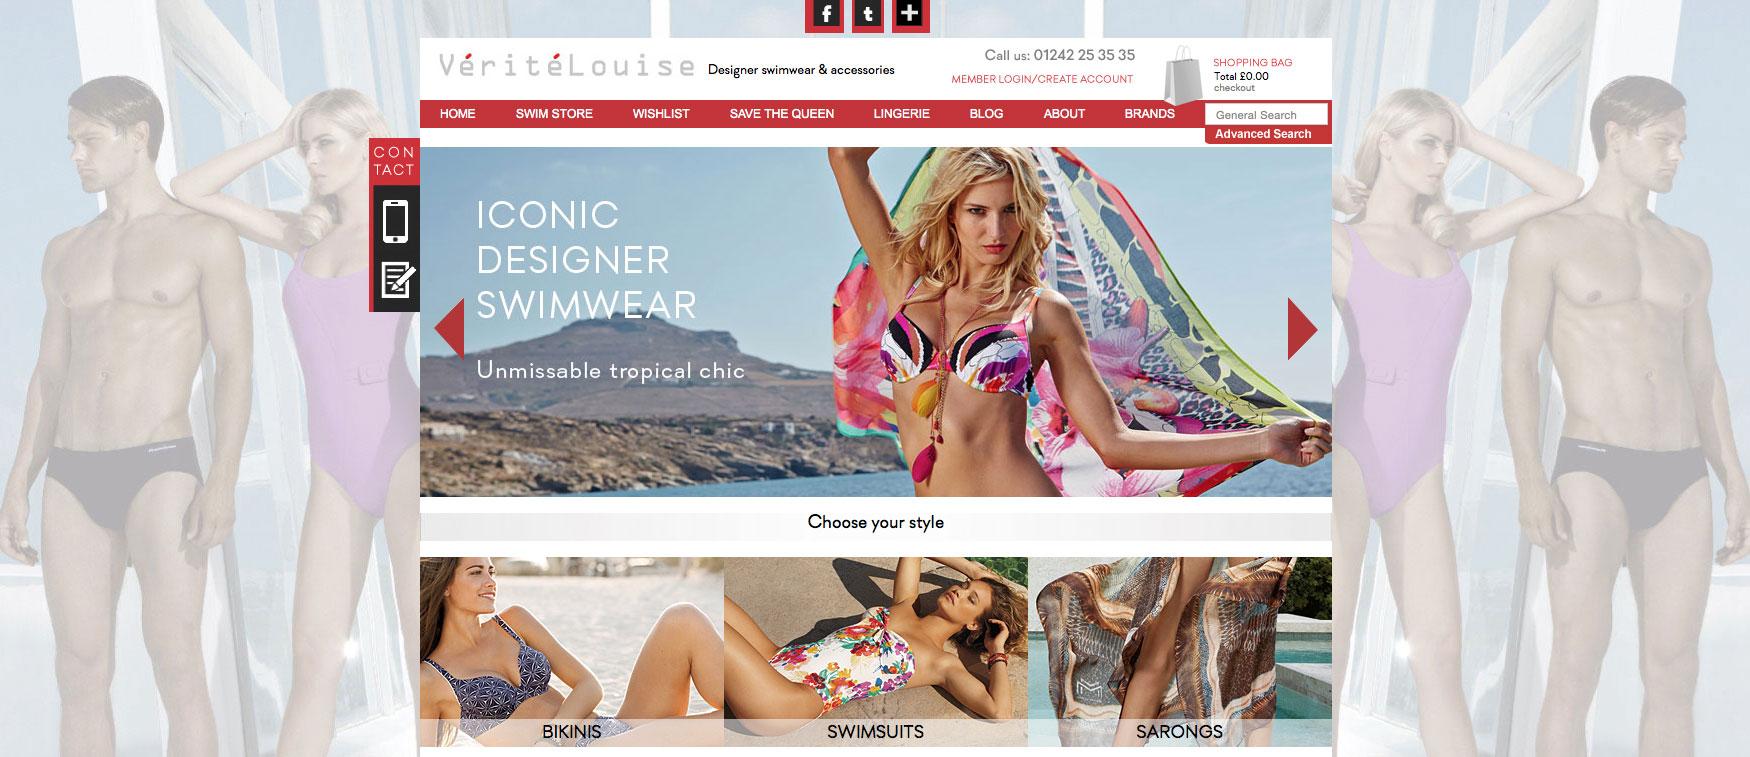 Responsive Wordpress ecommerce website design and development.